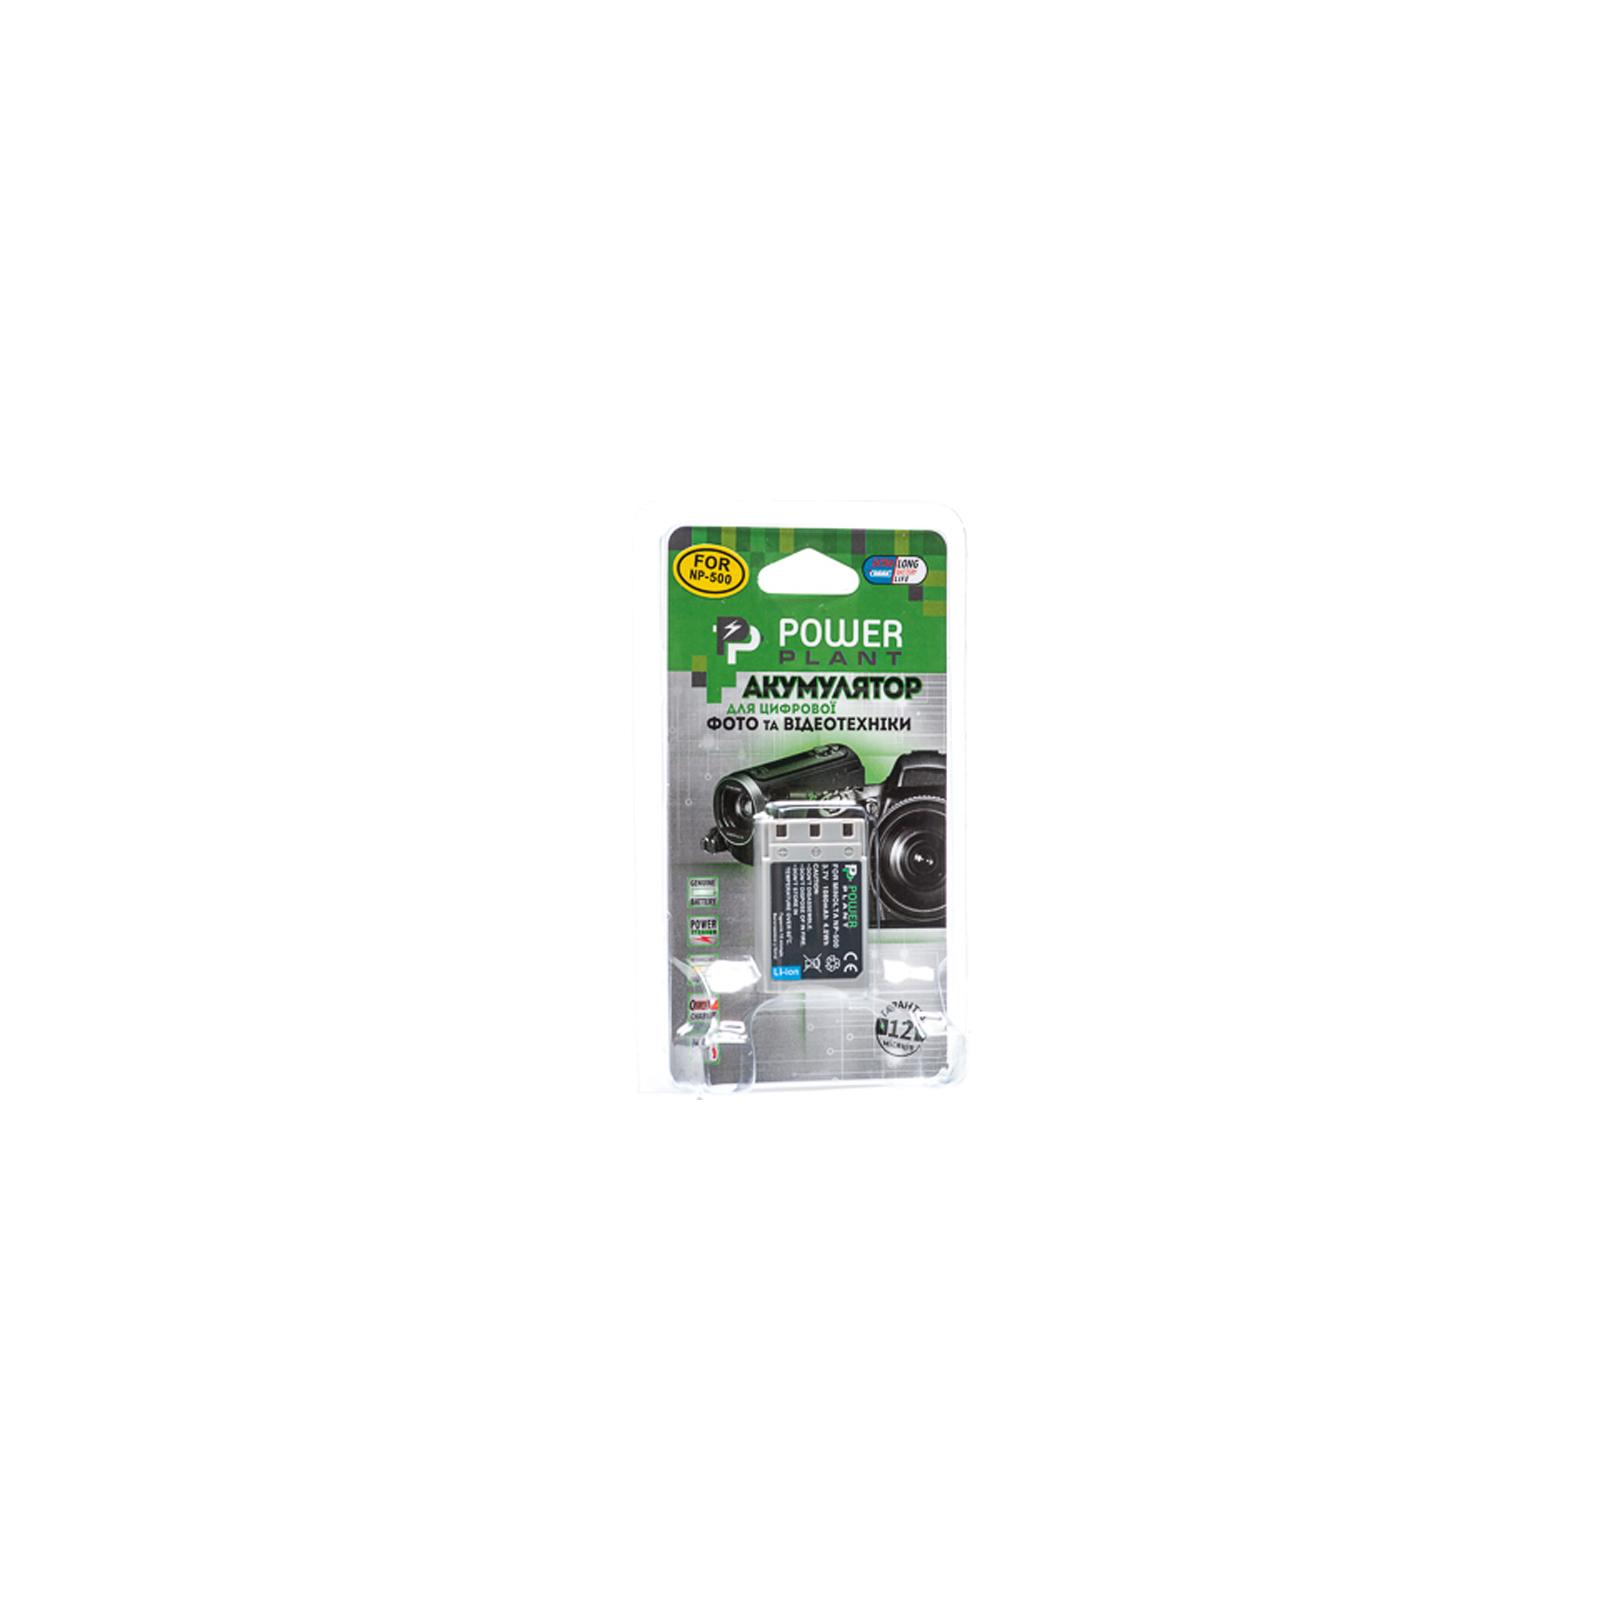 Аккумулятор к фото/видео PowerPlant Minolta NP-500, NP-600 (DV00DV1054) изображение 3